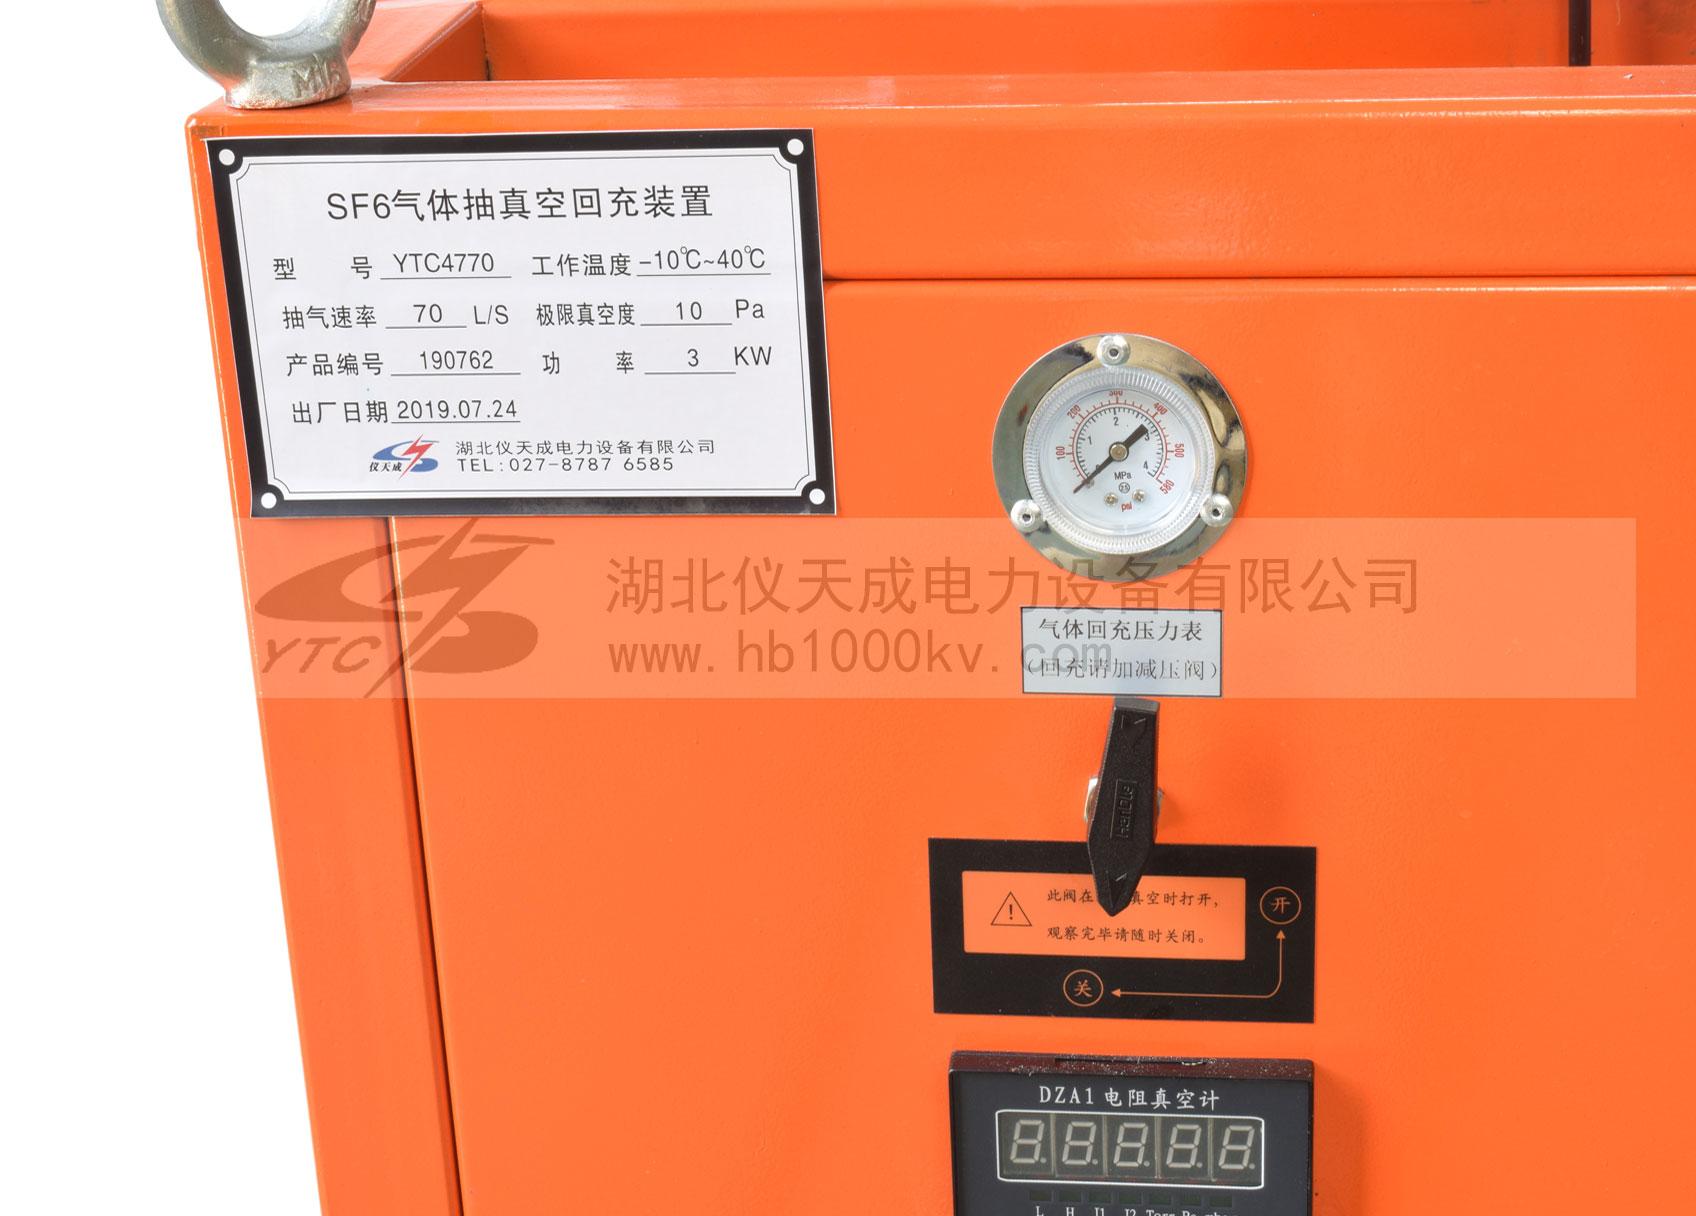 YTC4770 SF6气体抽真空充气装置节图